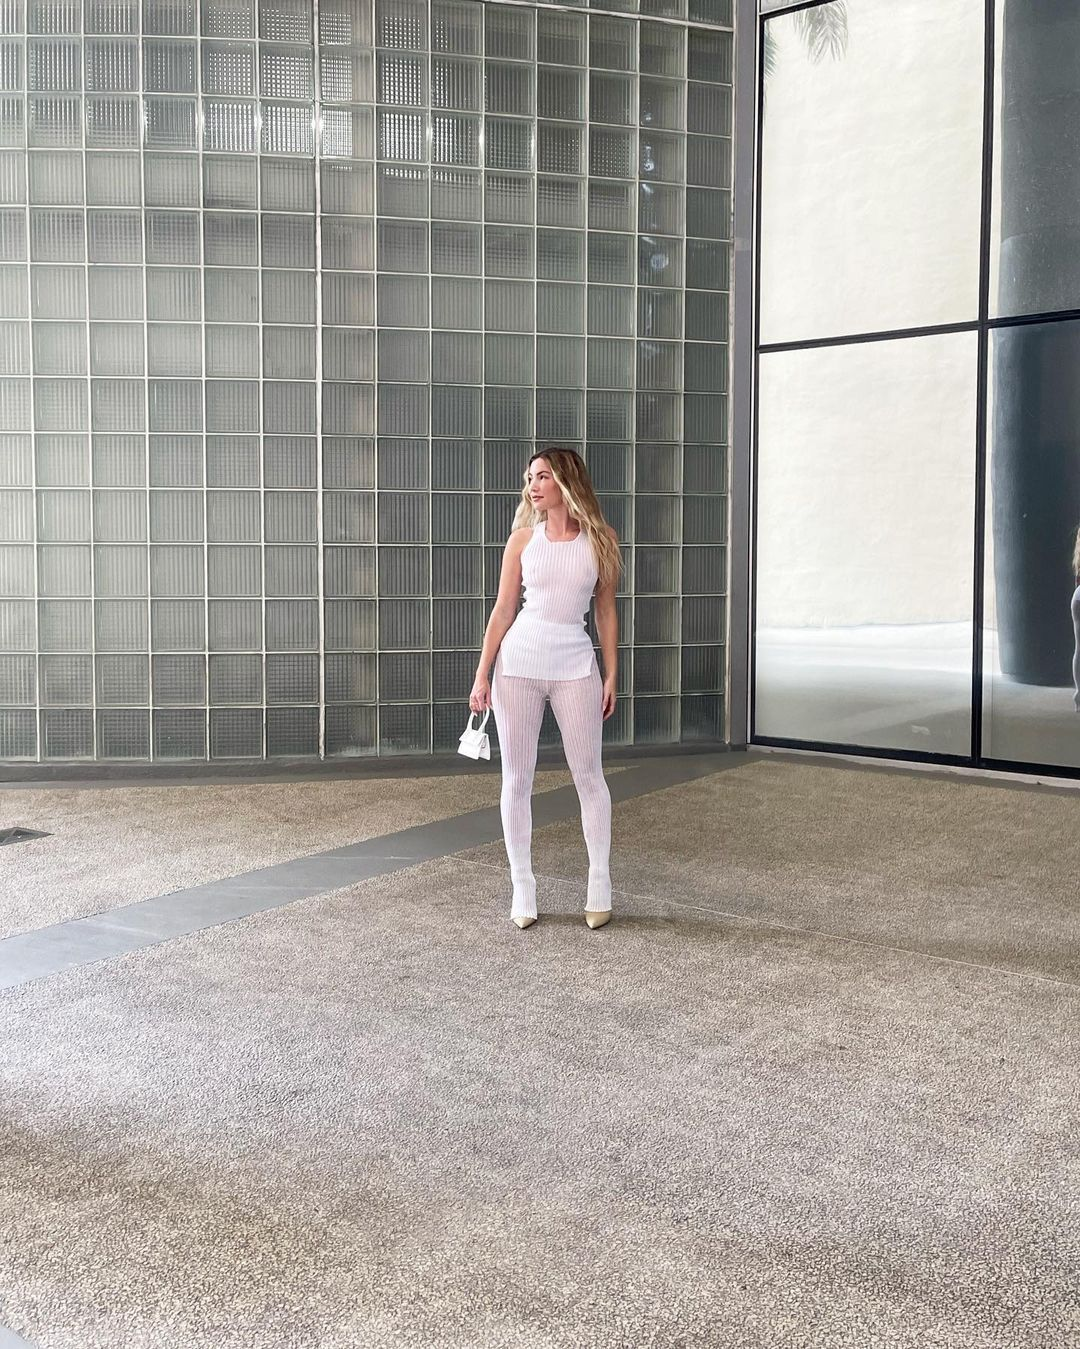 Casie Davis Sheer Outfit